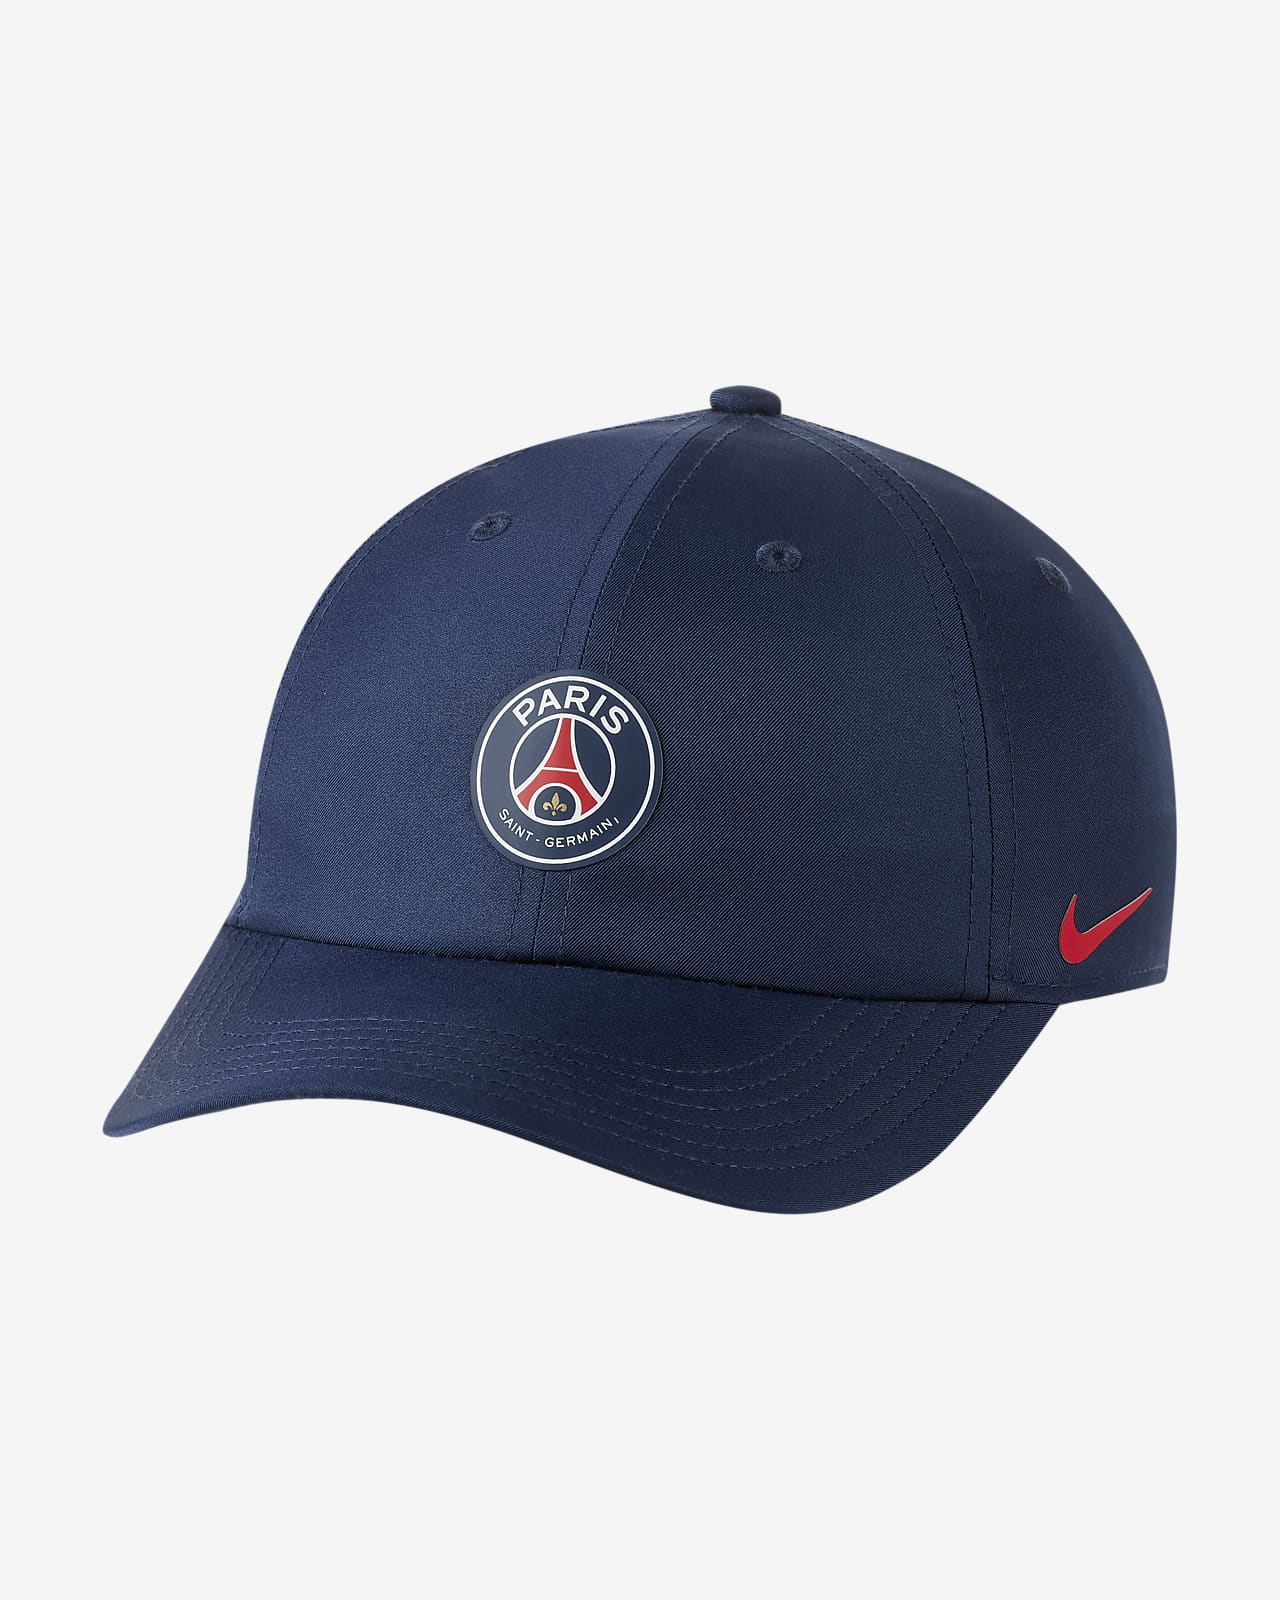 Nike Dri-FIT Paris Saint-Germain Heritage86 Kids' Adjustable Hat